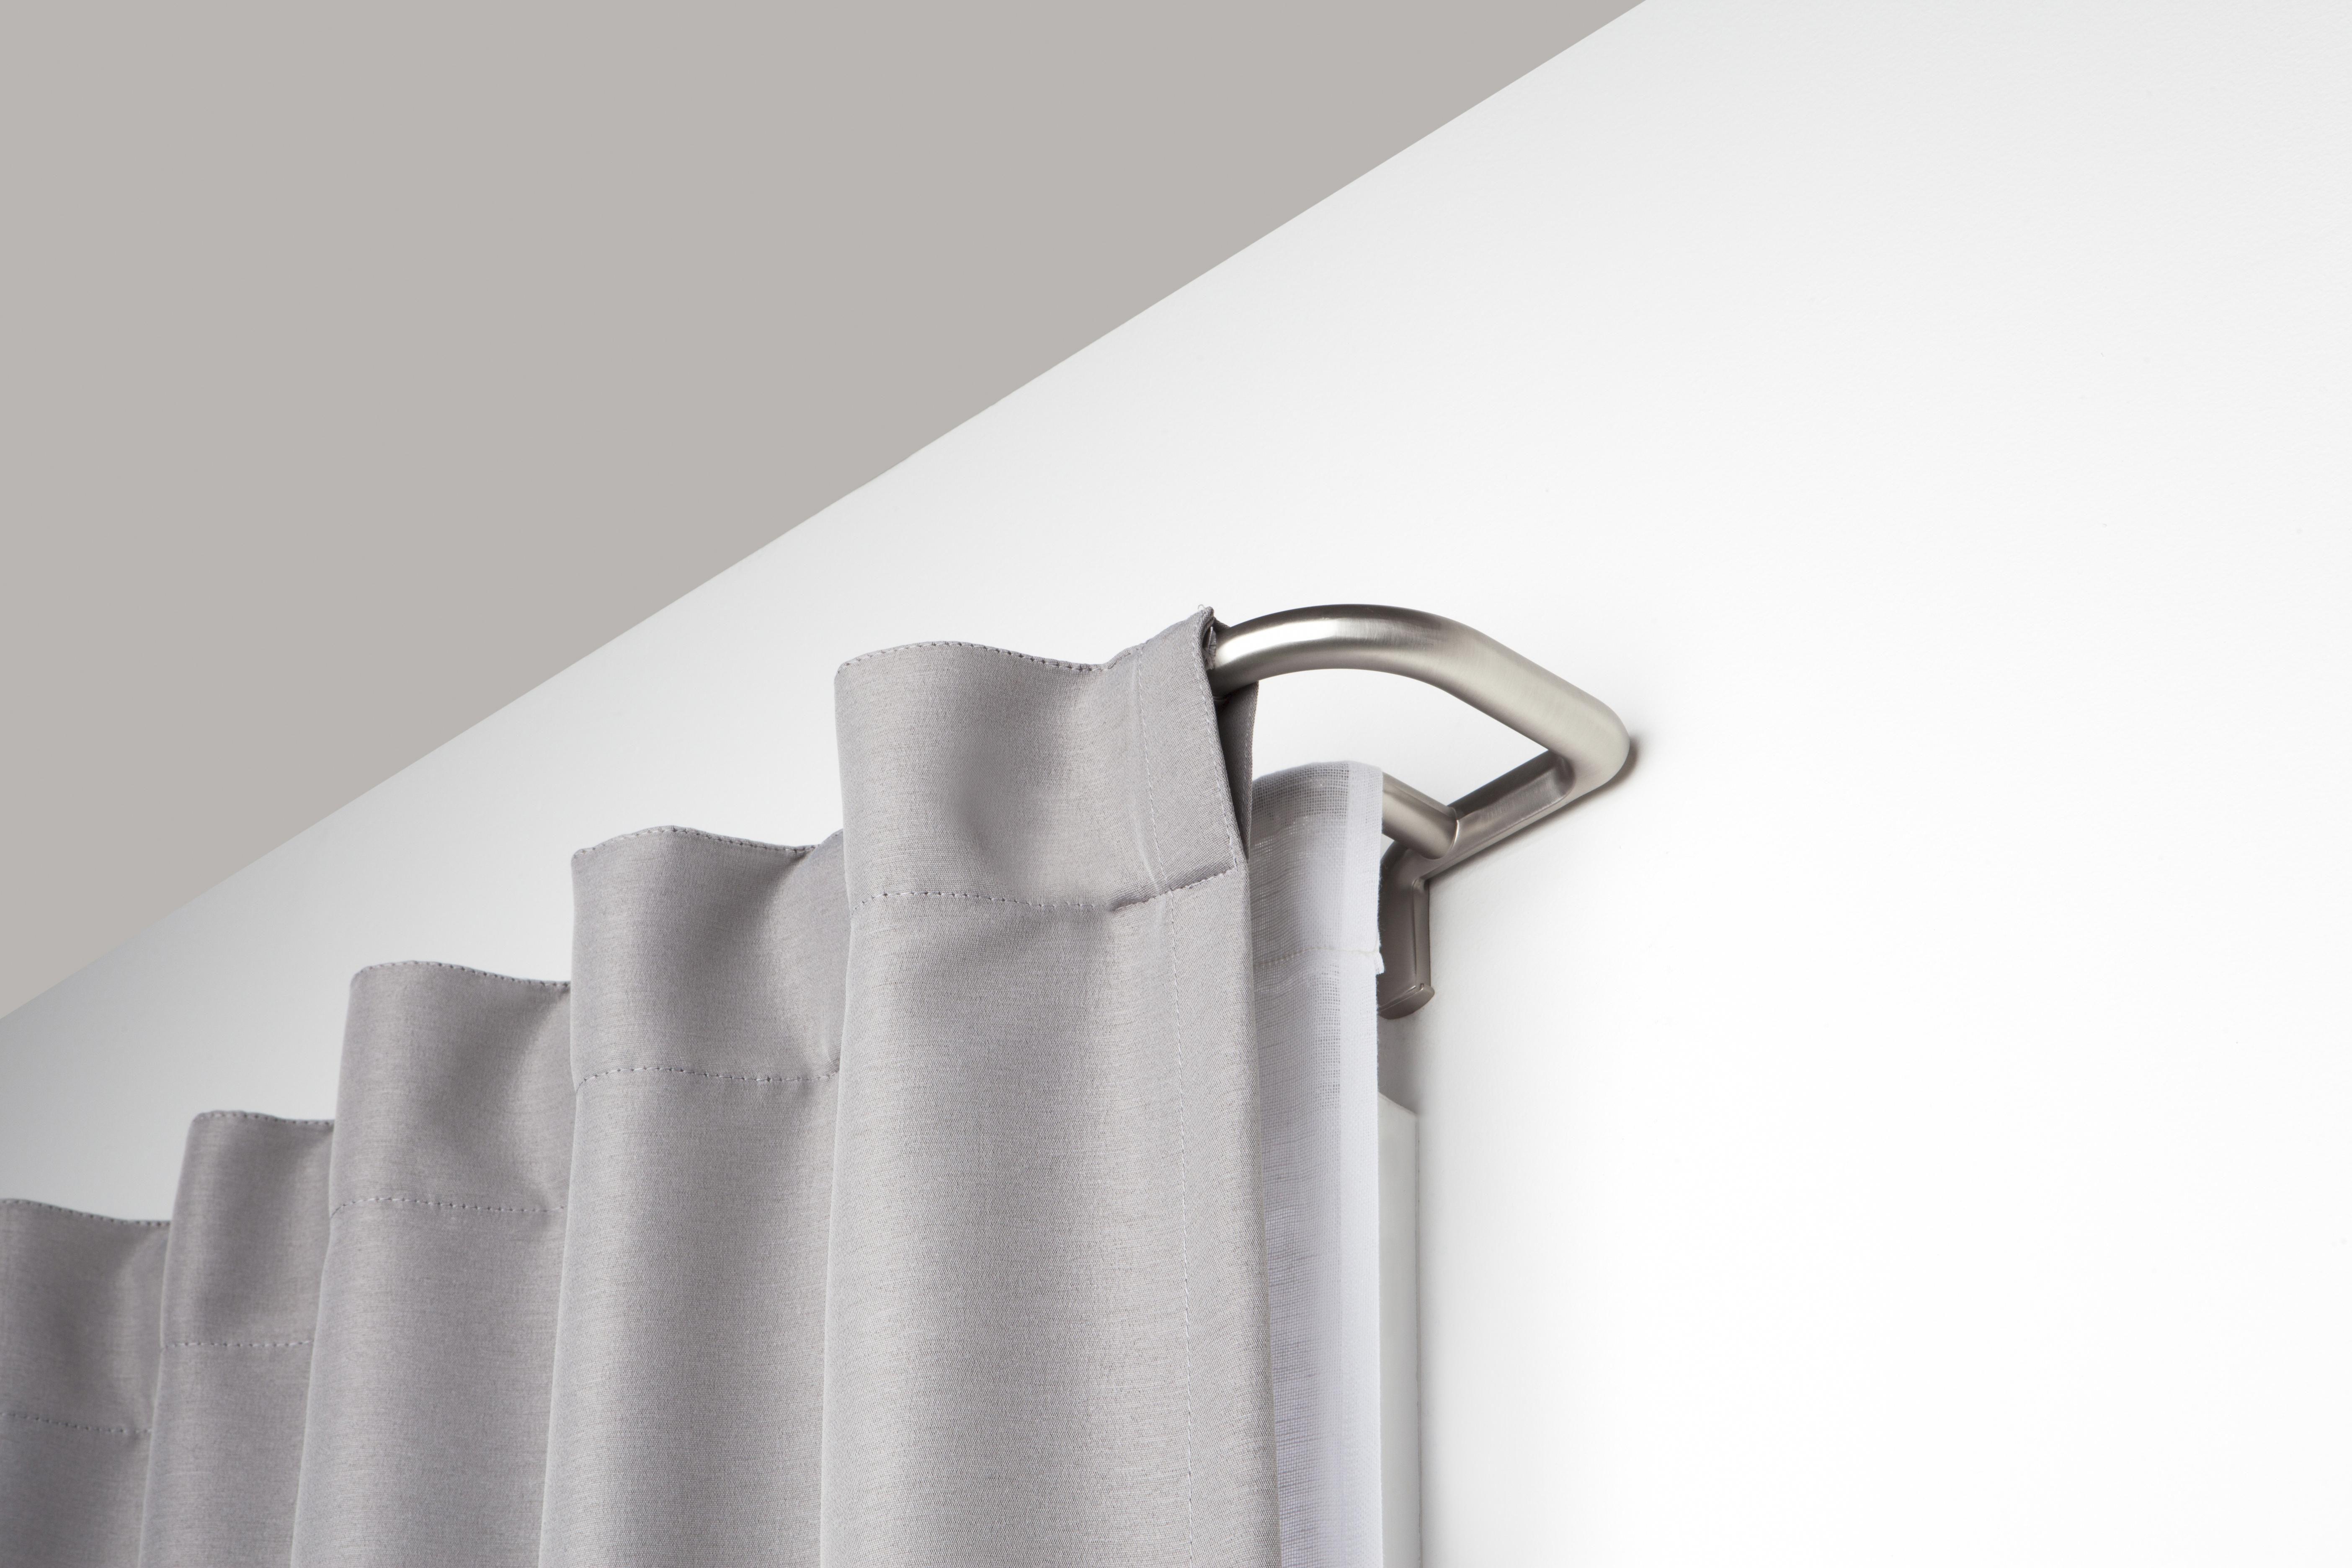 Umbra Twilight Double Curtain Rod Set A Wrap Around Design Is